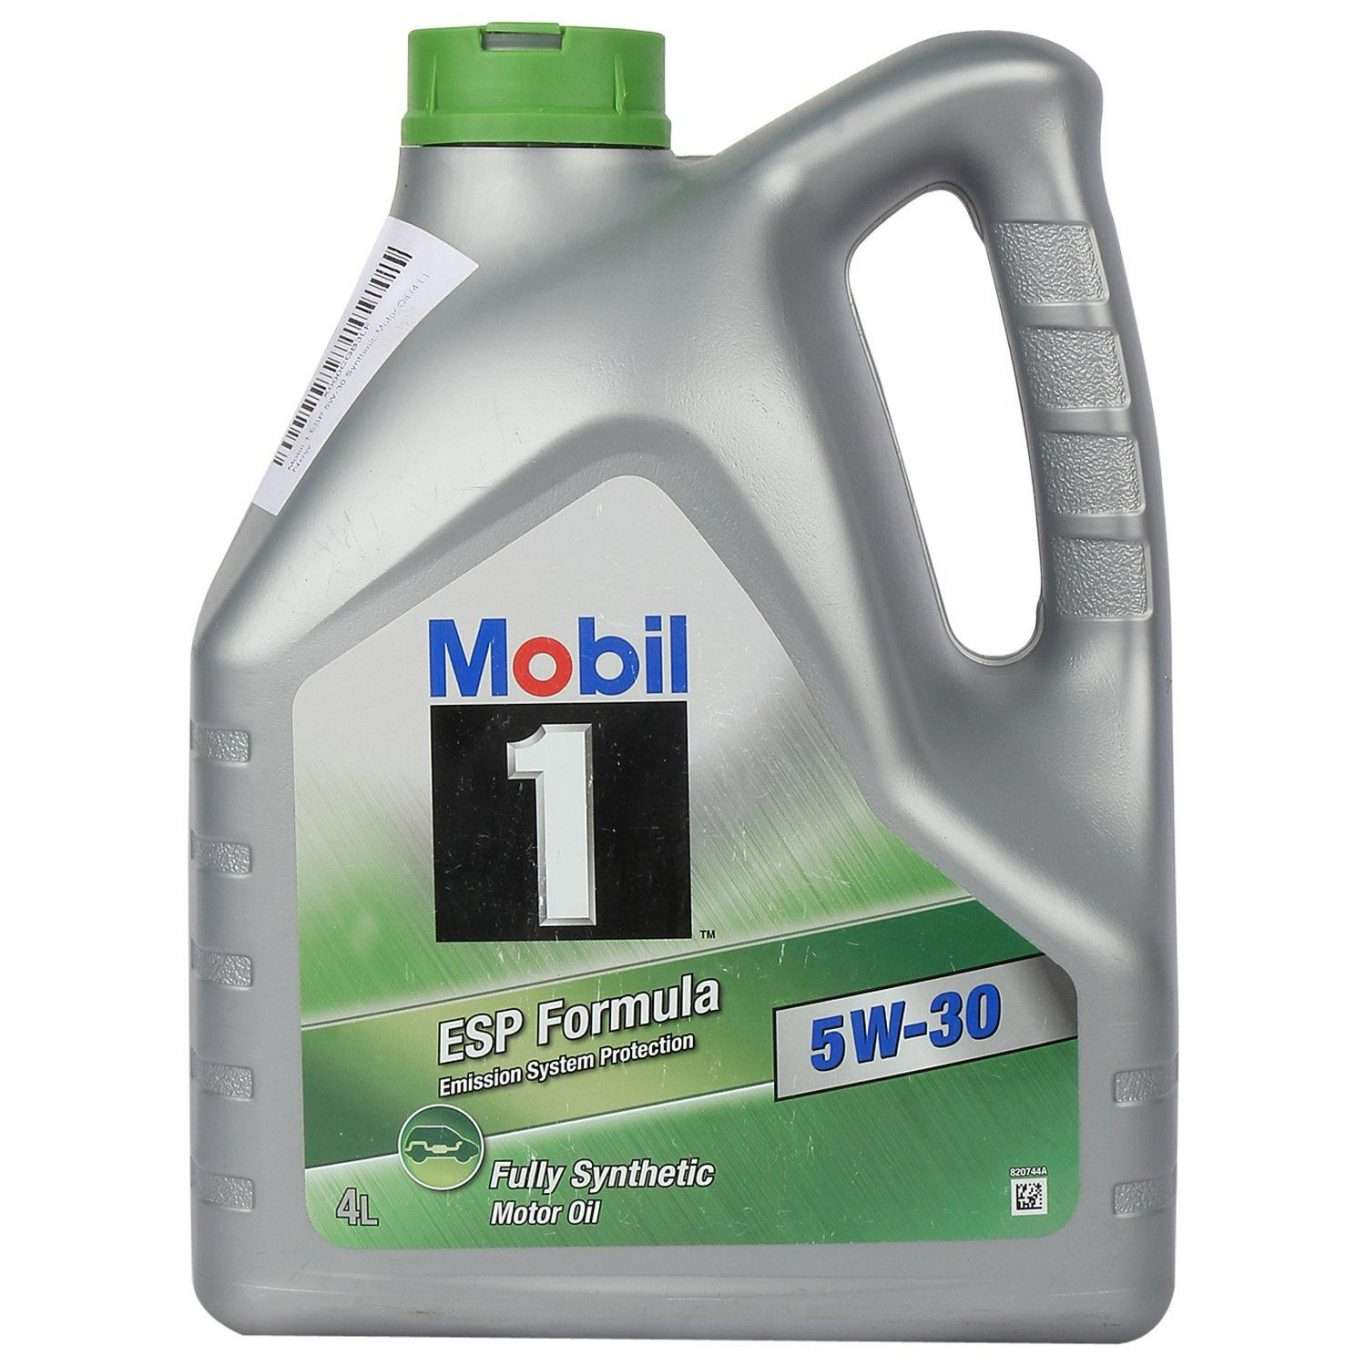 Mobil 1 Petrol Engine Oil 5W-30